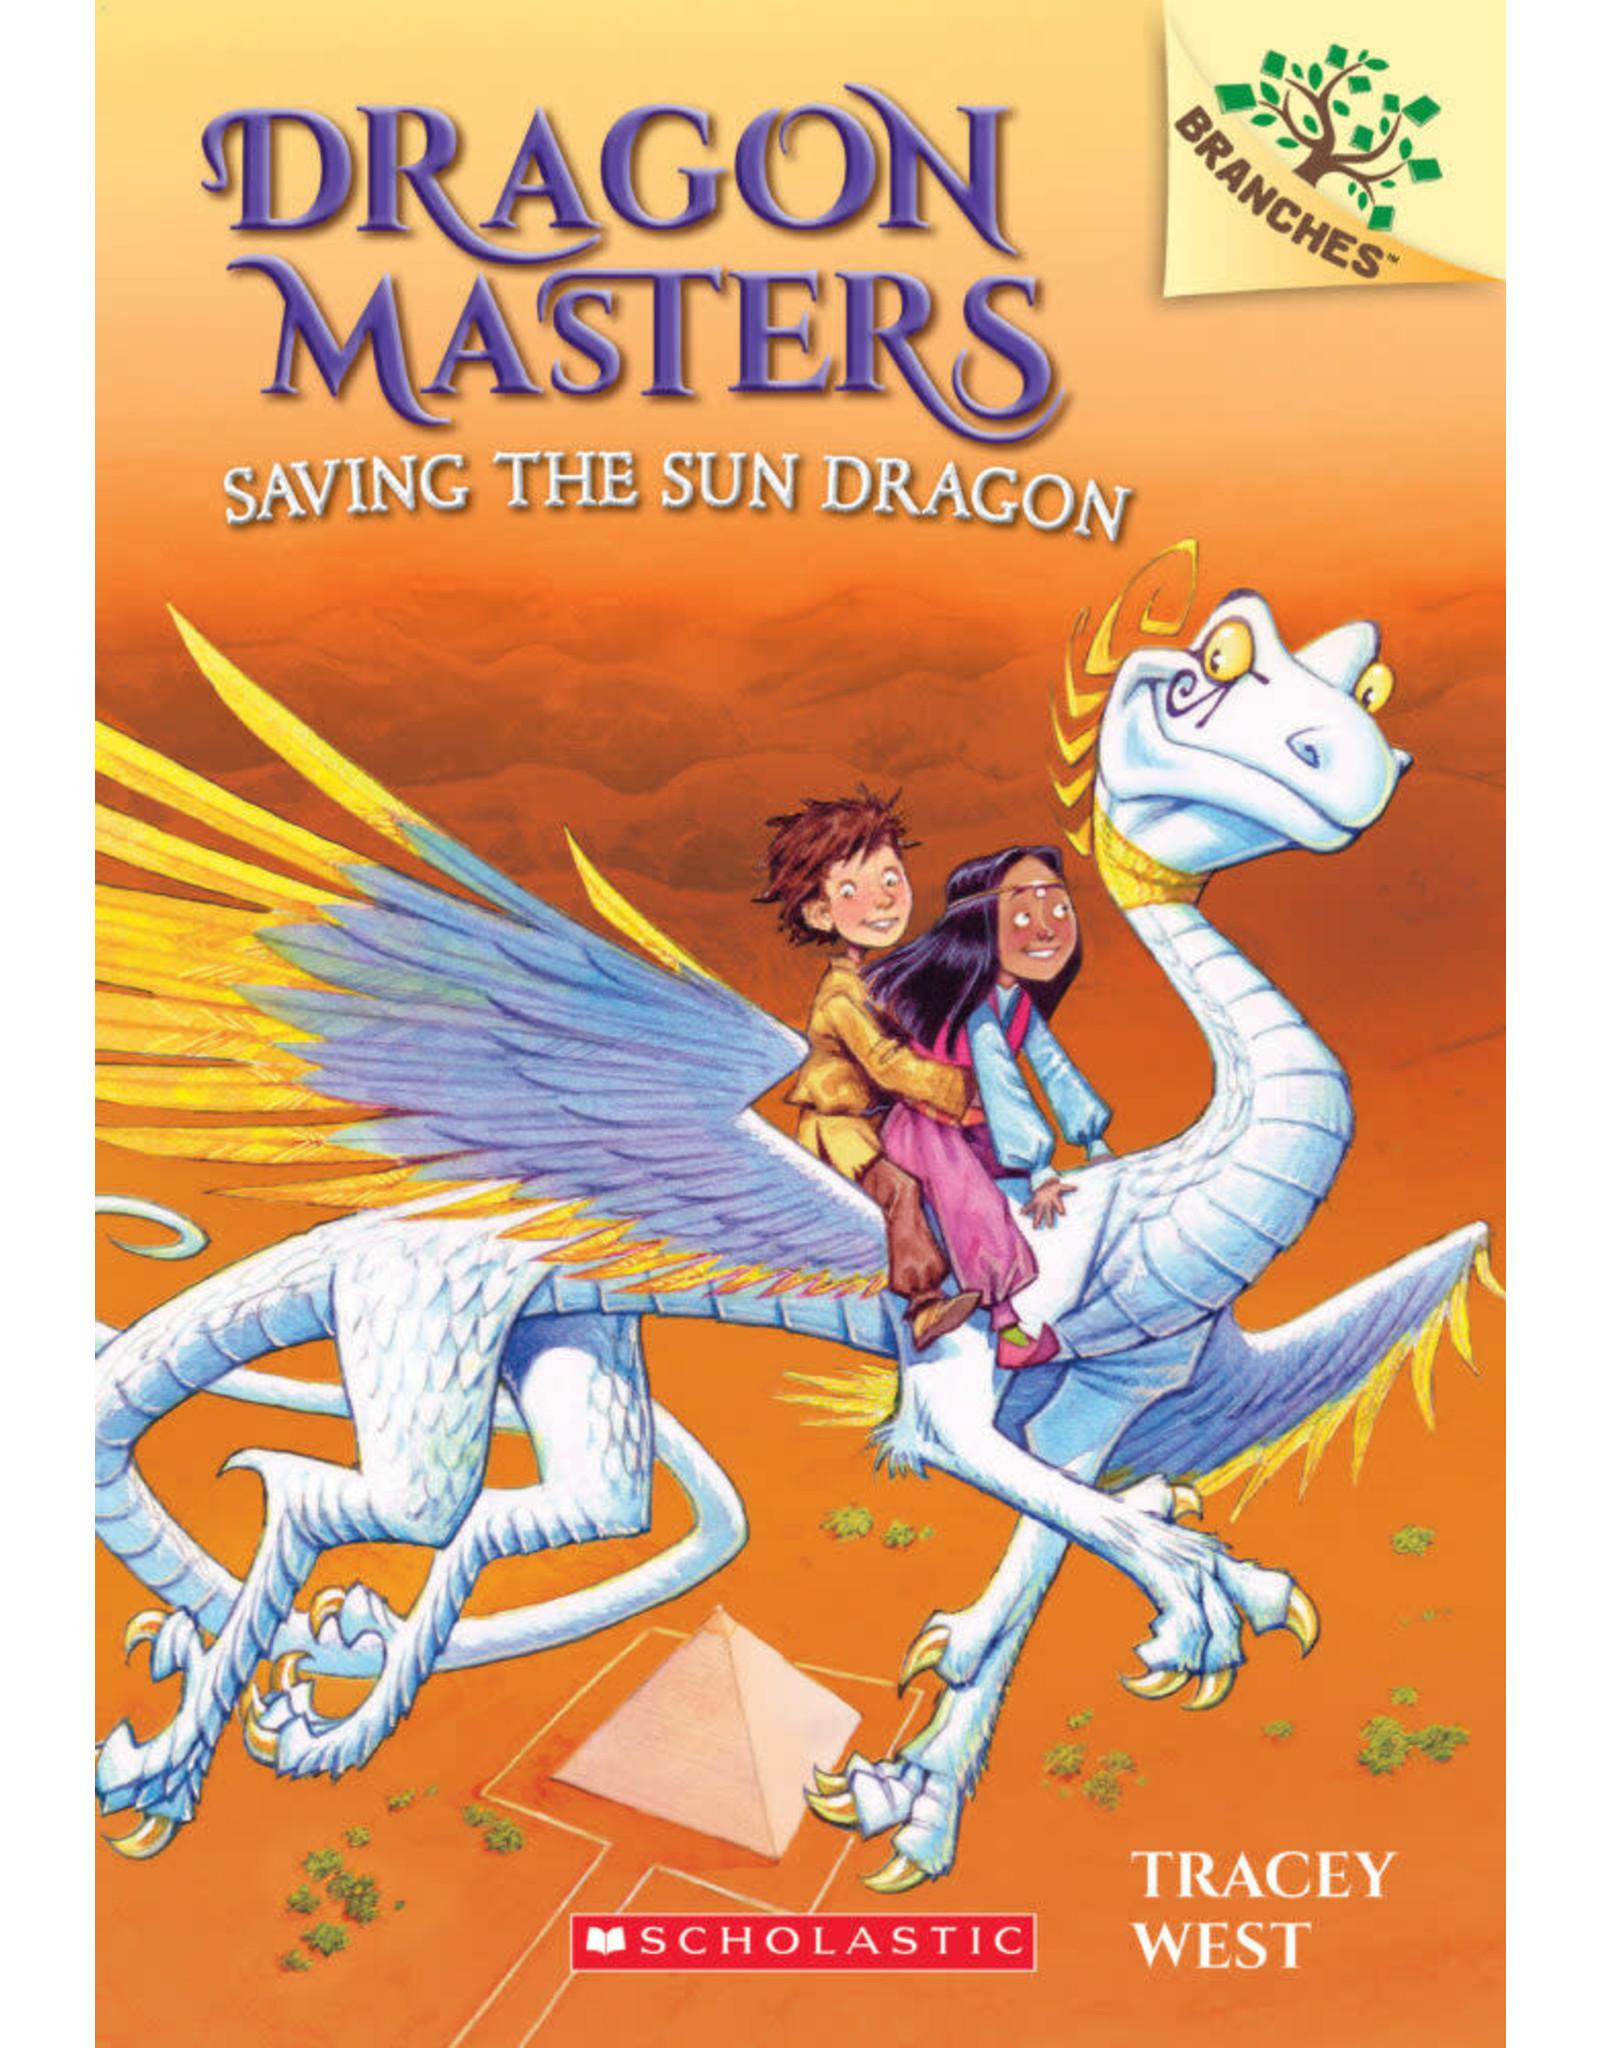 SCHOLASTIC INC. DRAGON MASTERS #2 SAVING THE SUN DRAGON